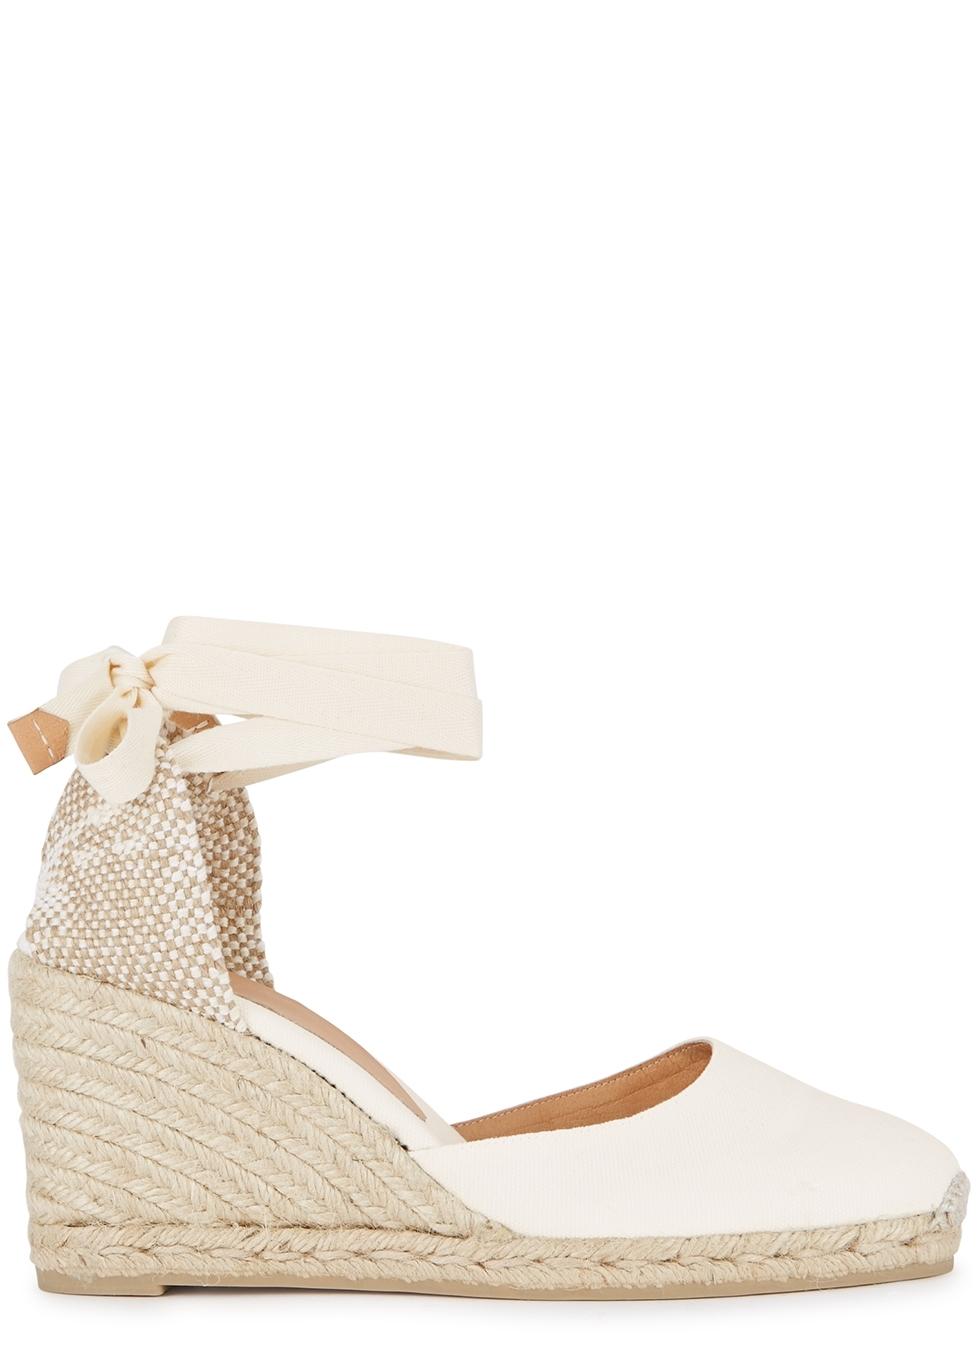 48056ccdeb0 Women s Designer Sandals - Harvey Nichols